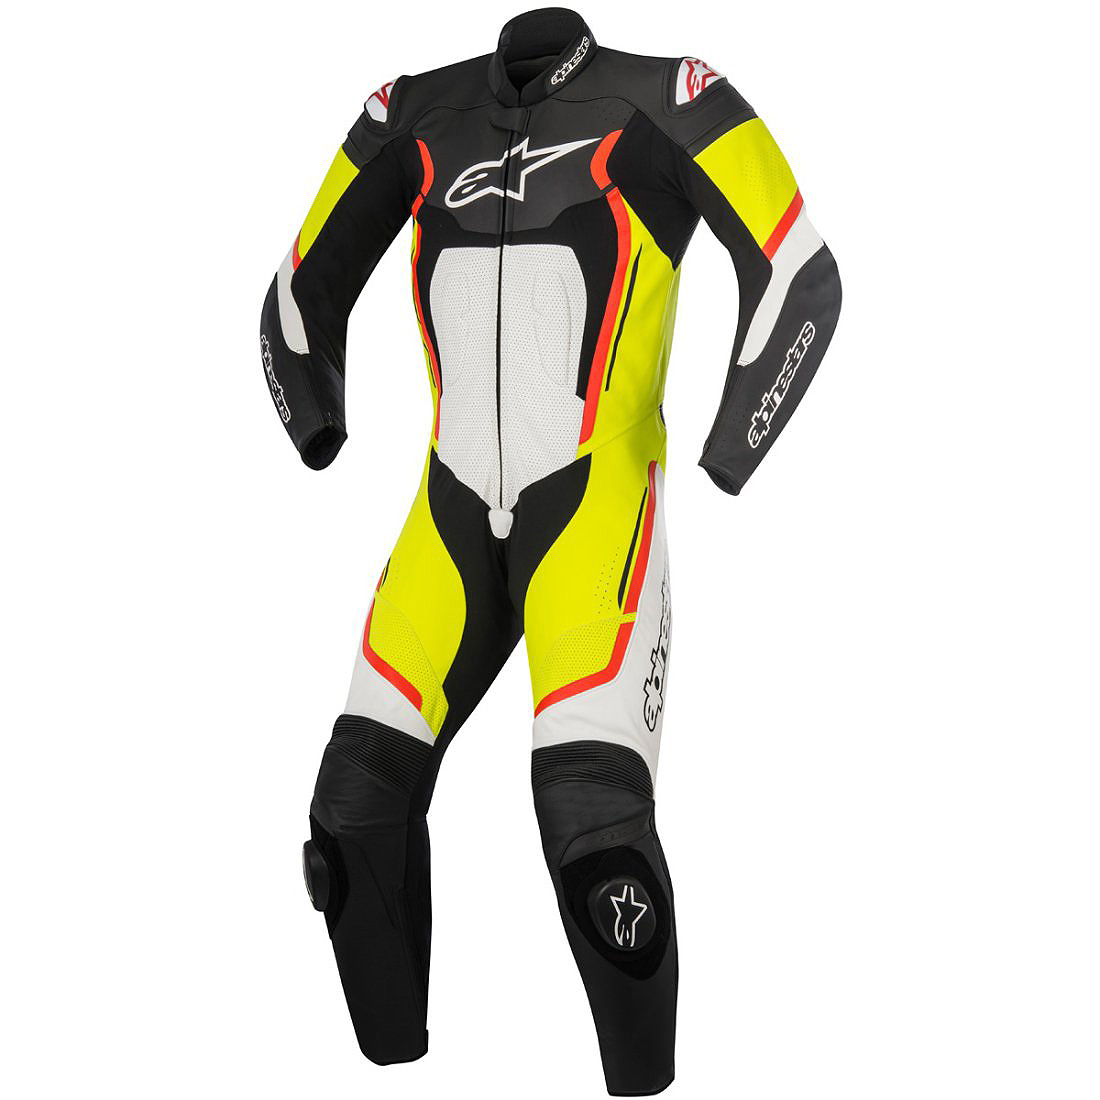 0 Macacão Alpinestars Motegi V2 - 1 Peça - Black / Yellow / Red - NOVO!  - Super Bike - Loja Oficial Alpinestars